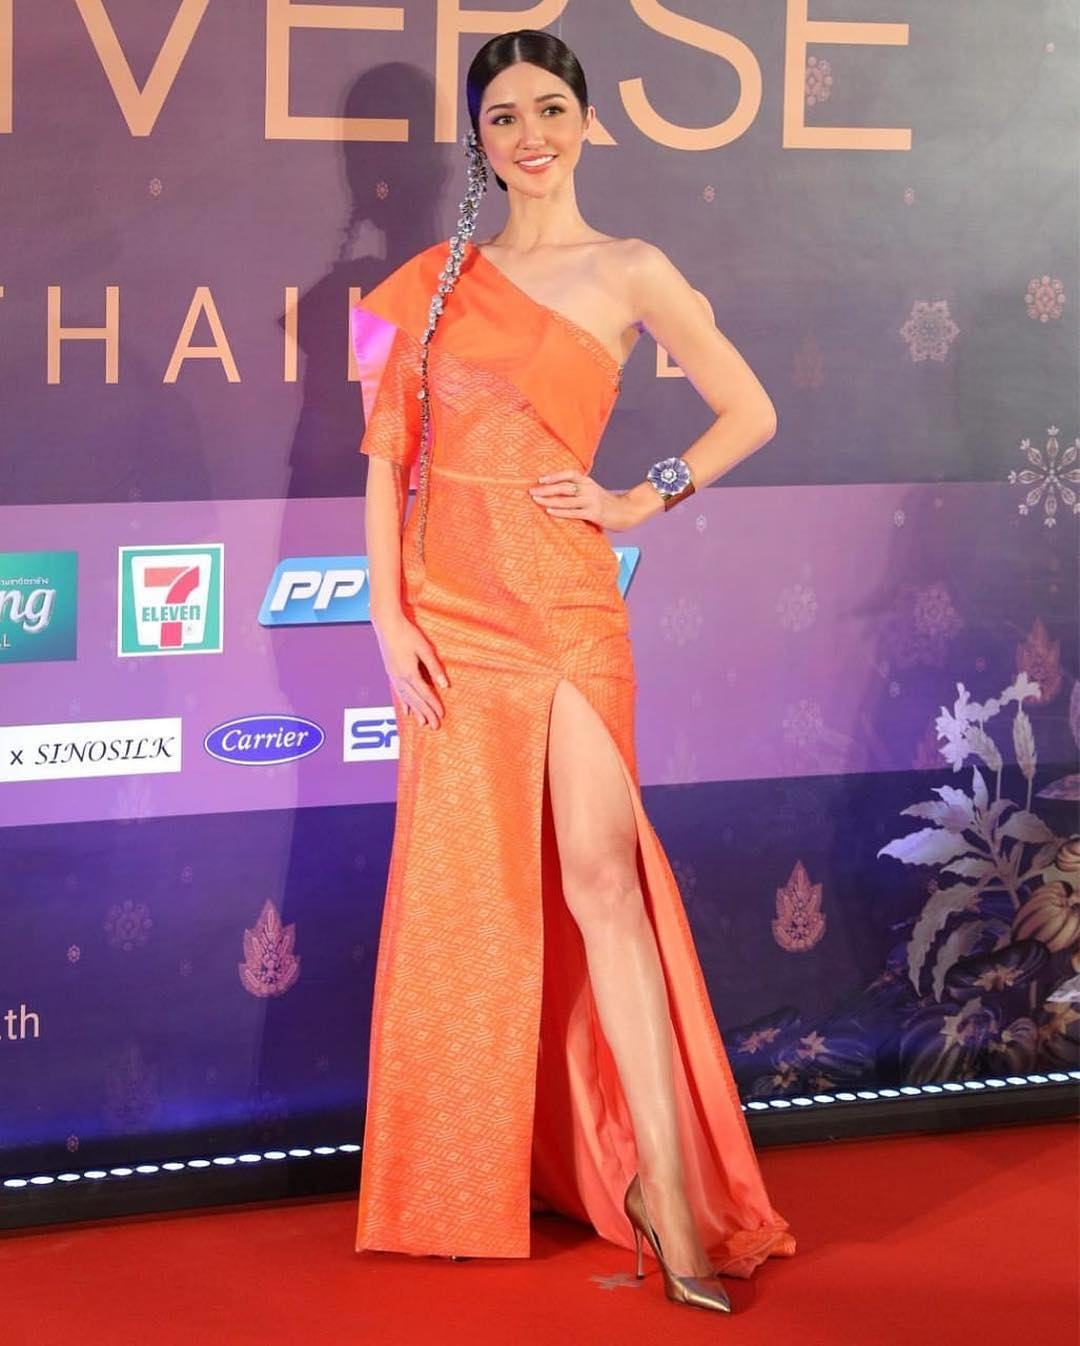 thai night gala dinner de candidatas a miss universe 2018. - Página 8 Q8uetqo6